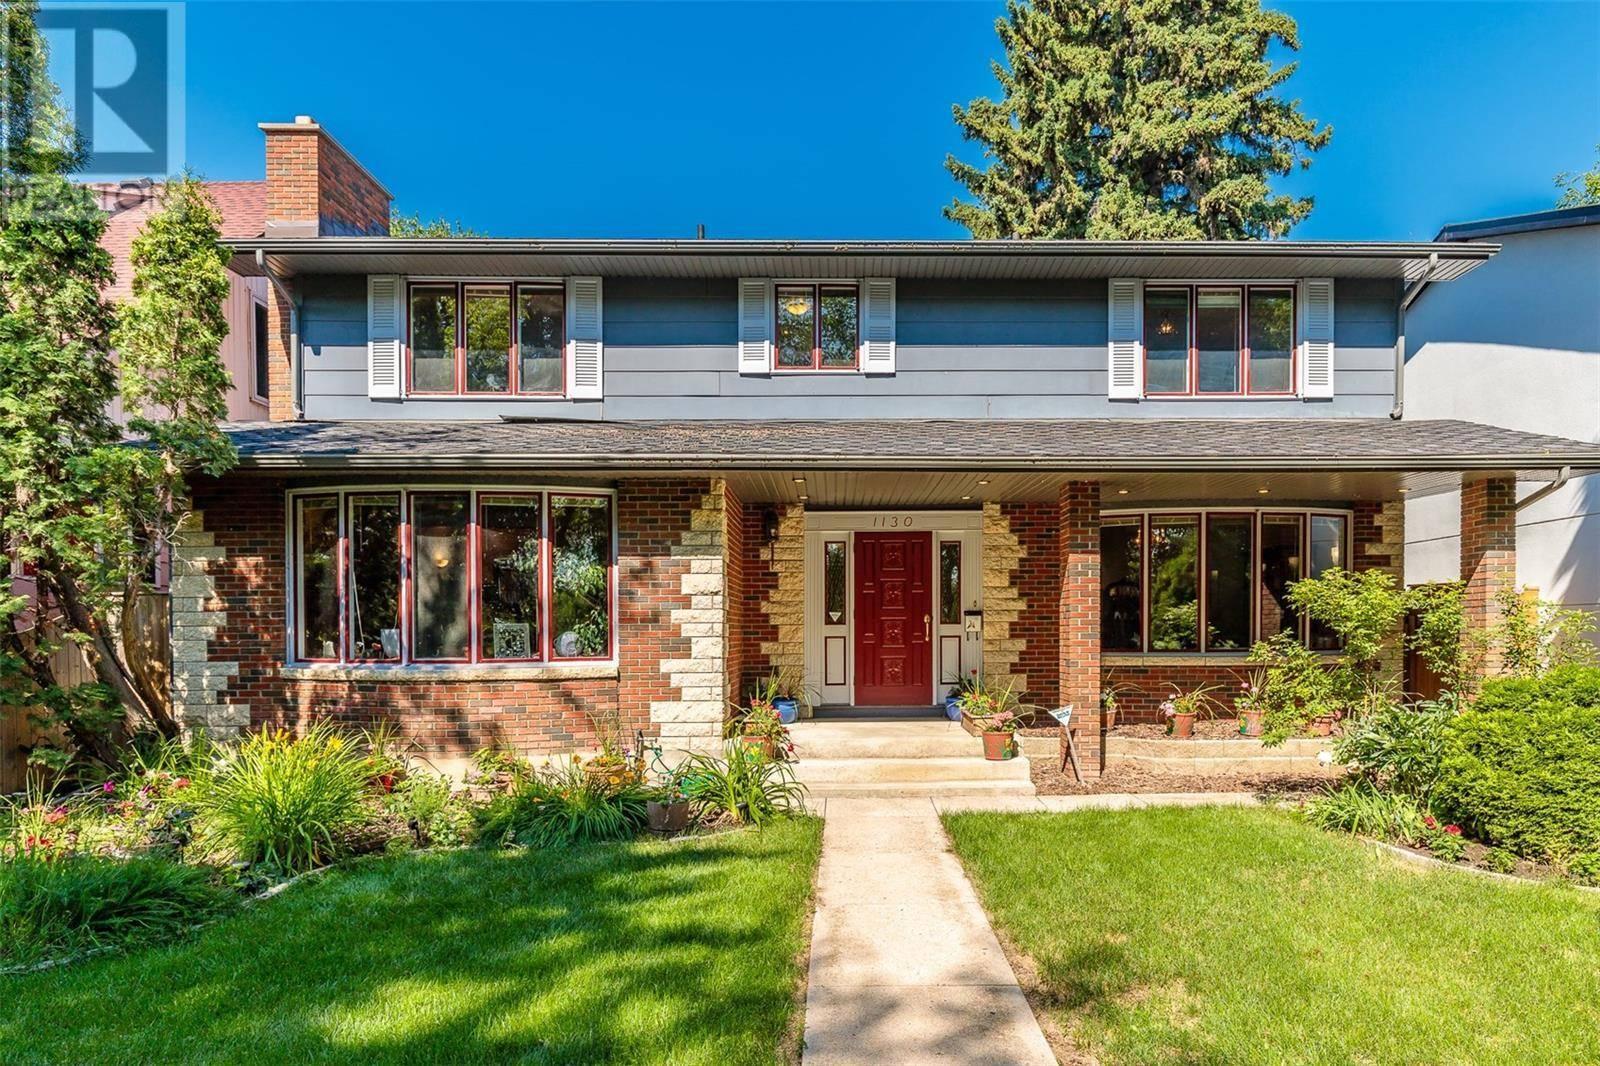 House for sale at 1130 Spadina Cres E Saskatoon Saskatchewan - MLS: SK772957